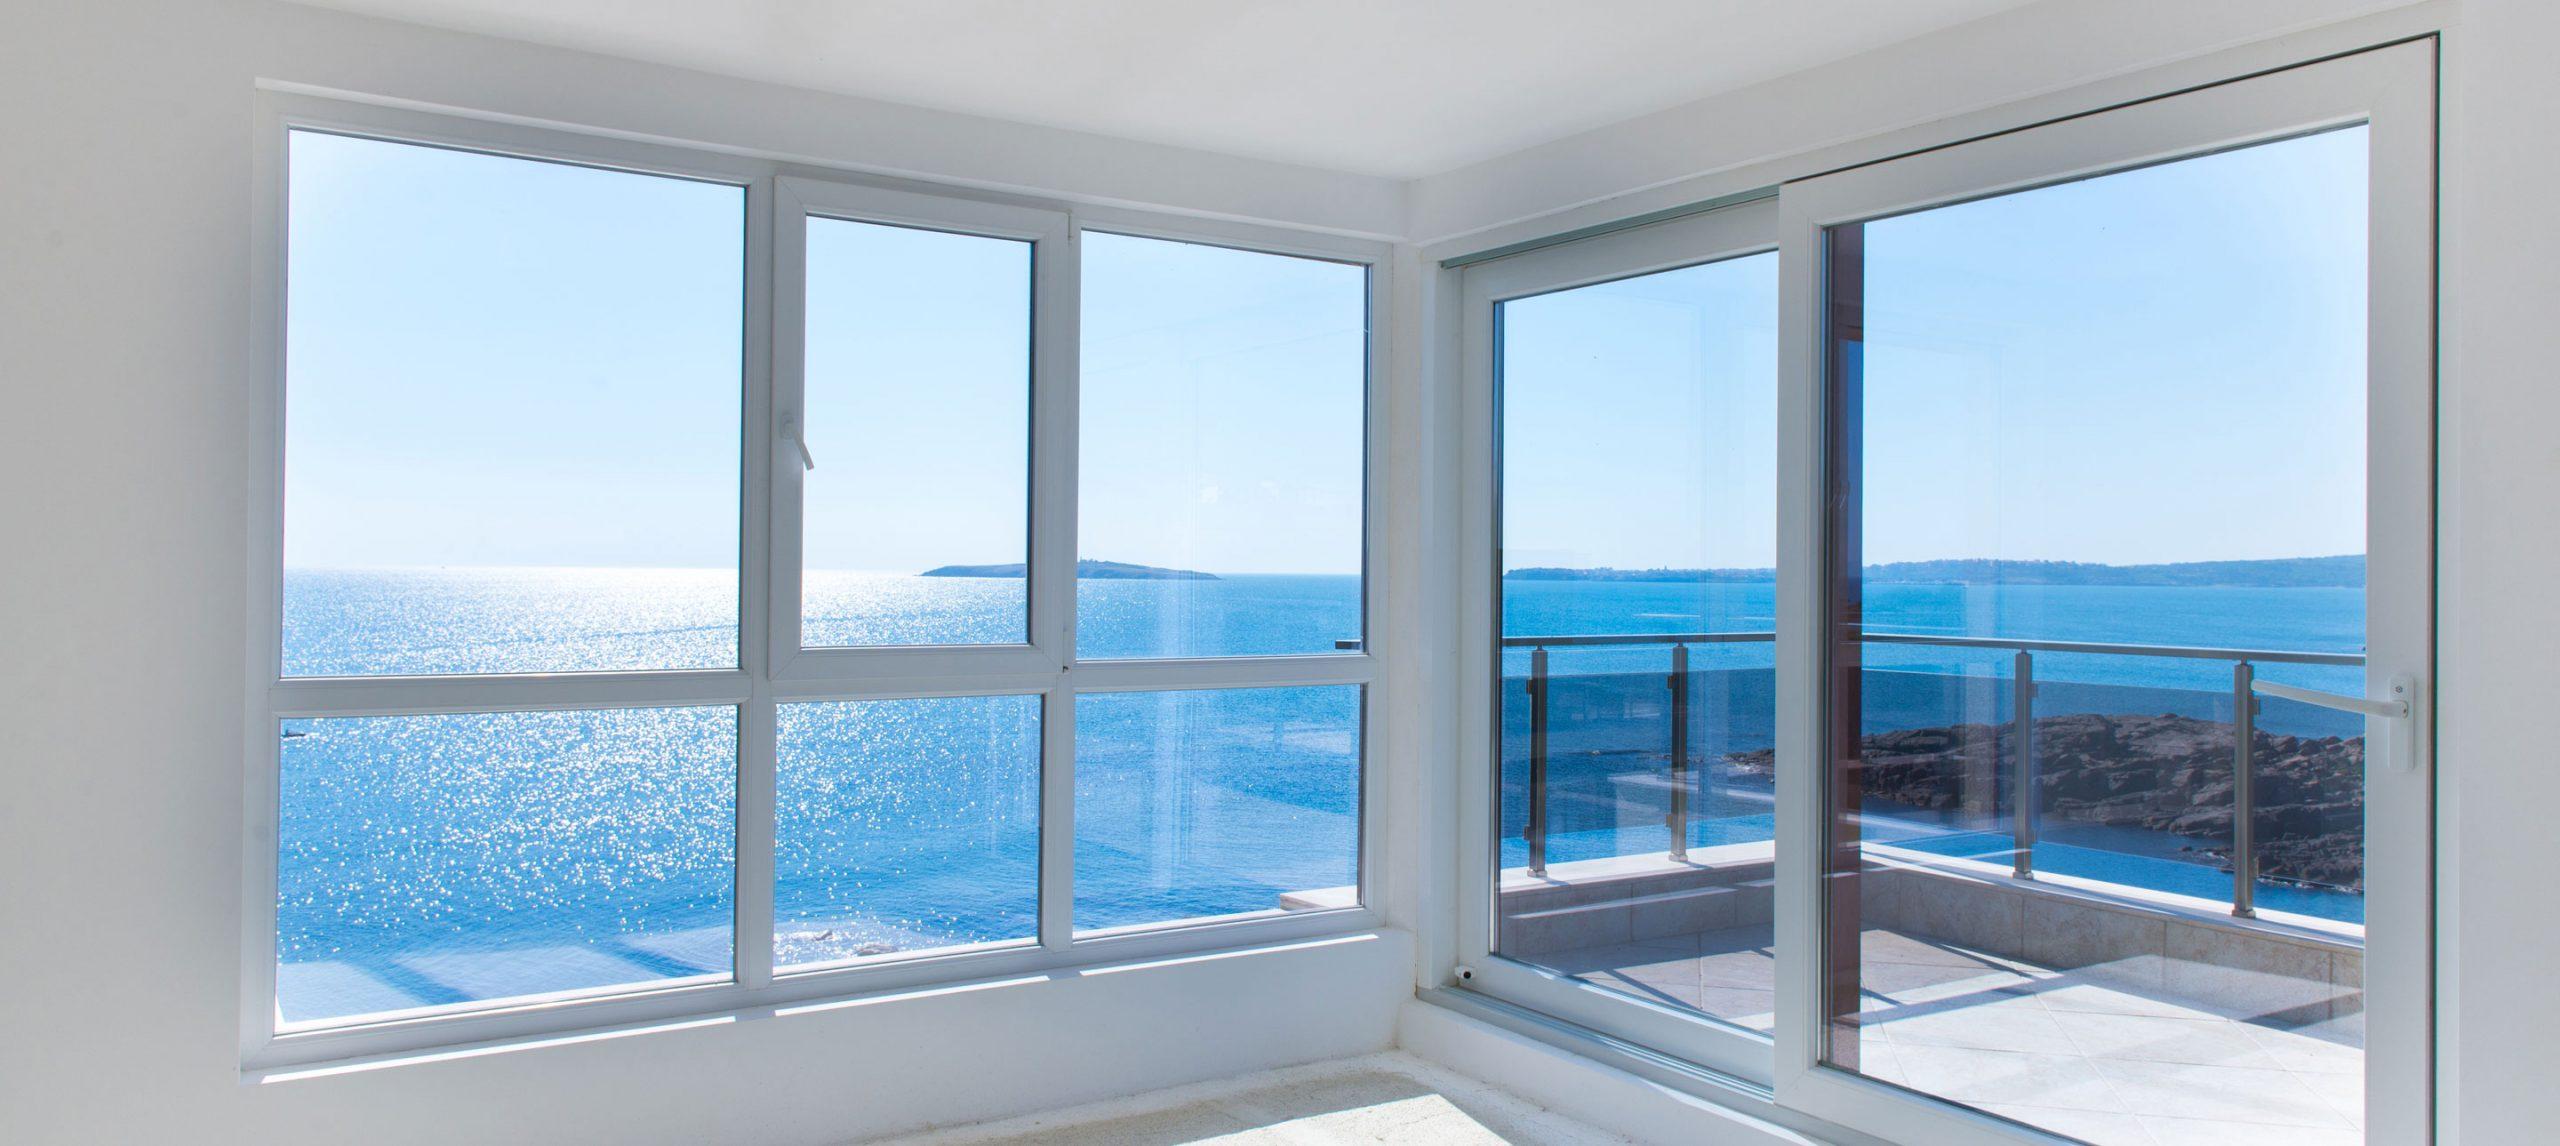 Avantajele usilor si ferestrelor termopane